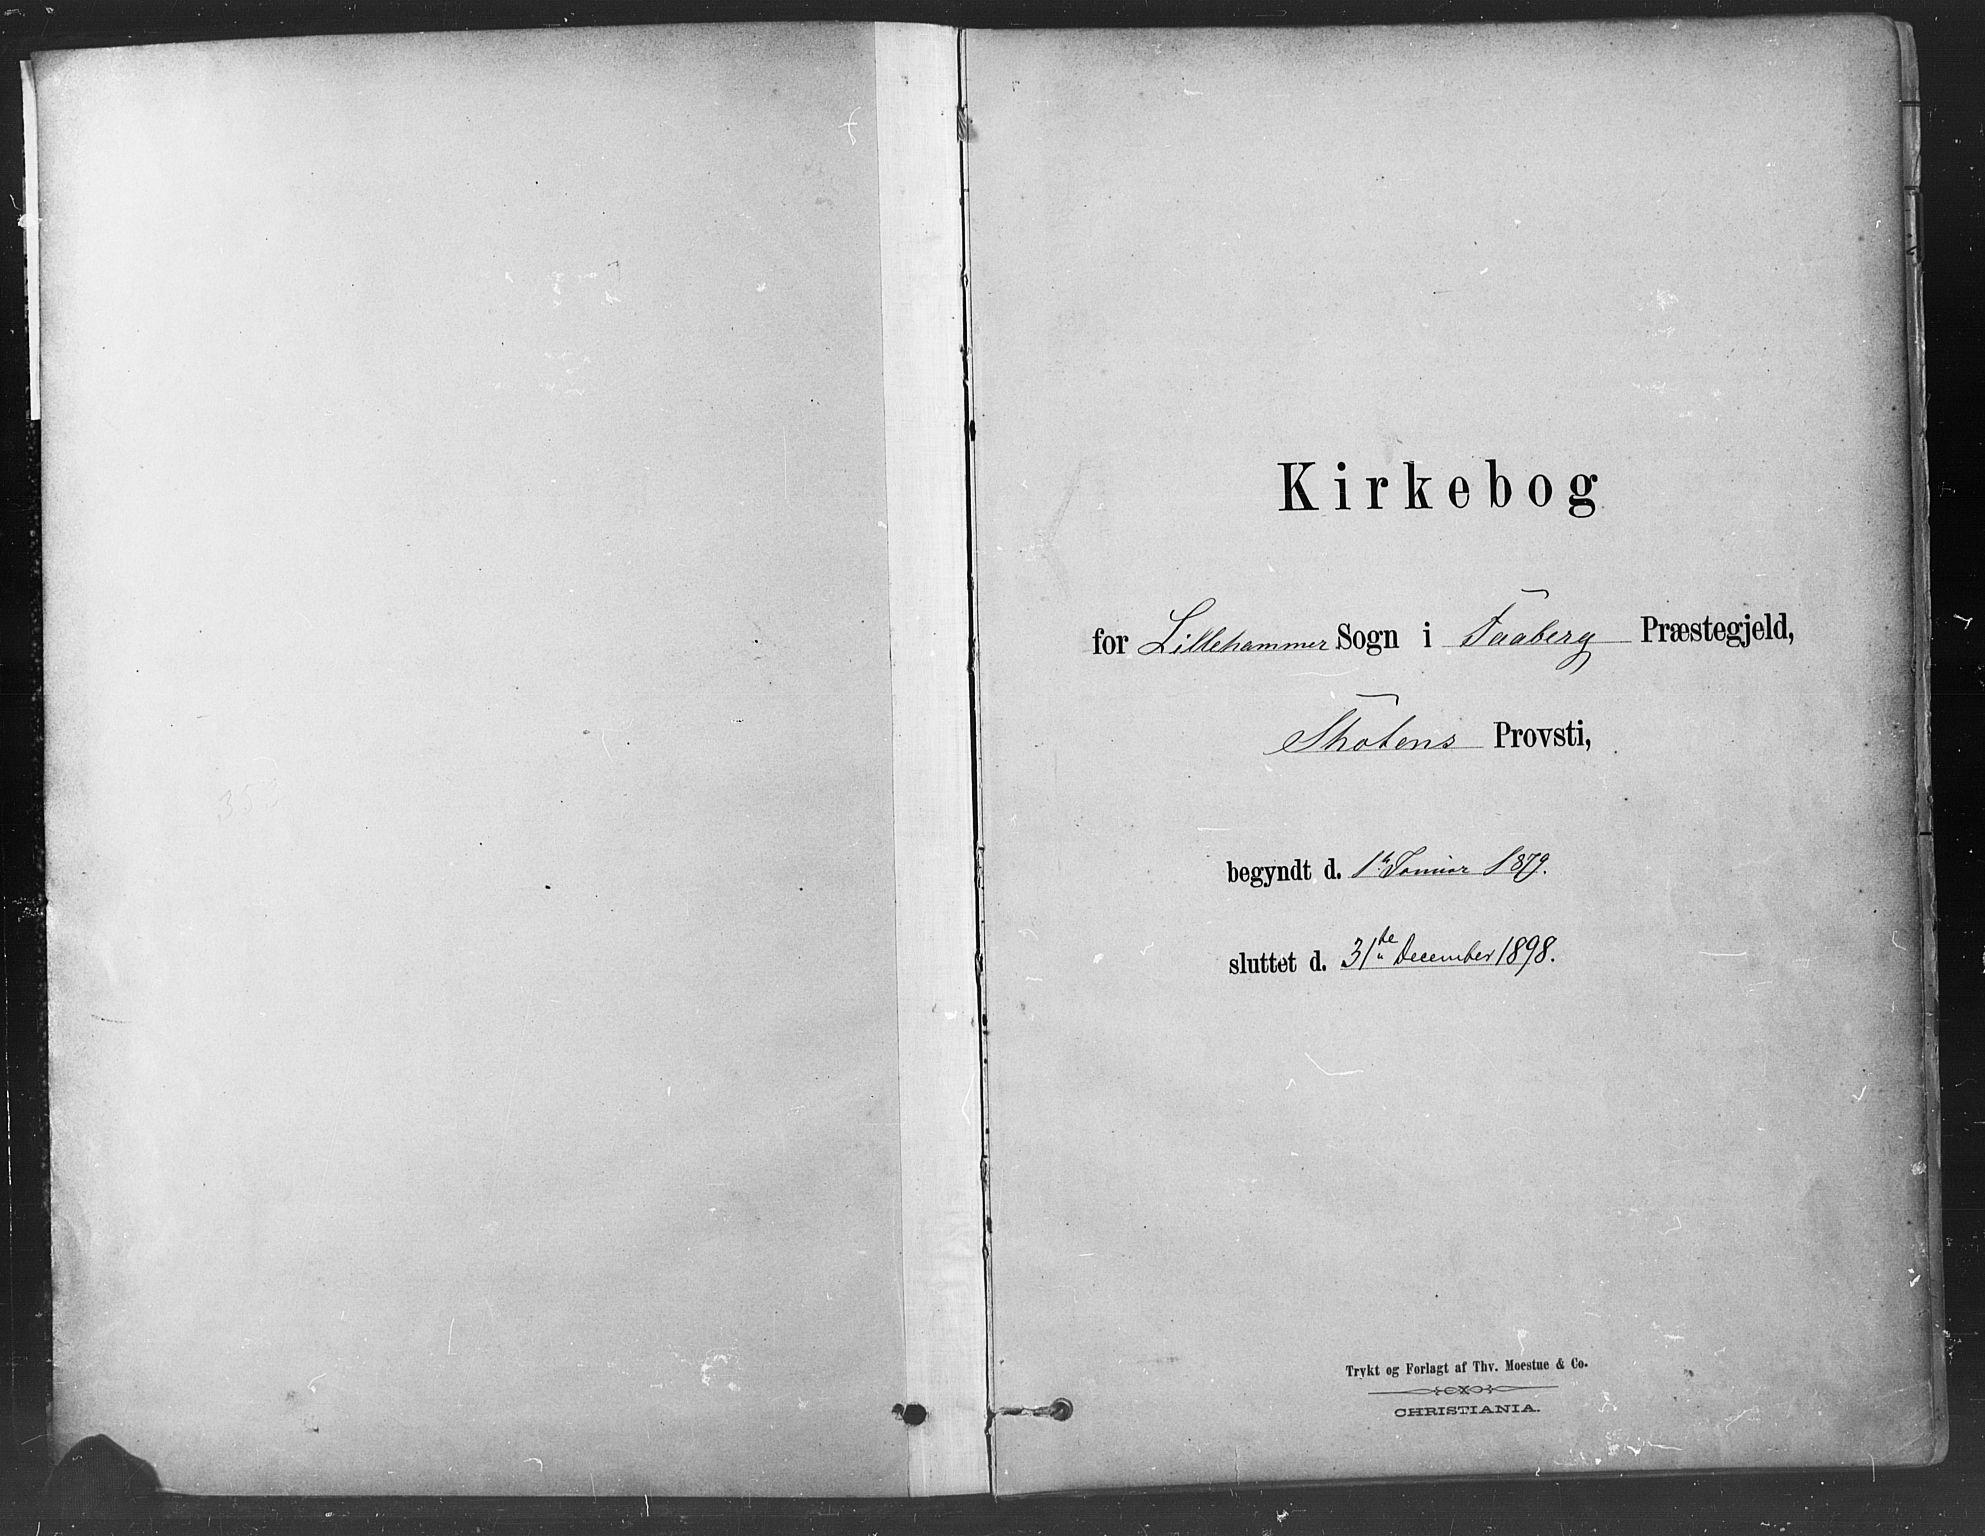 SAH, Fåberg prestekontor, H/Ha/Haa/L0009: Parish register (official) no. 9, 1879-1898